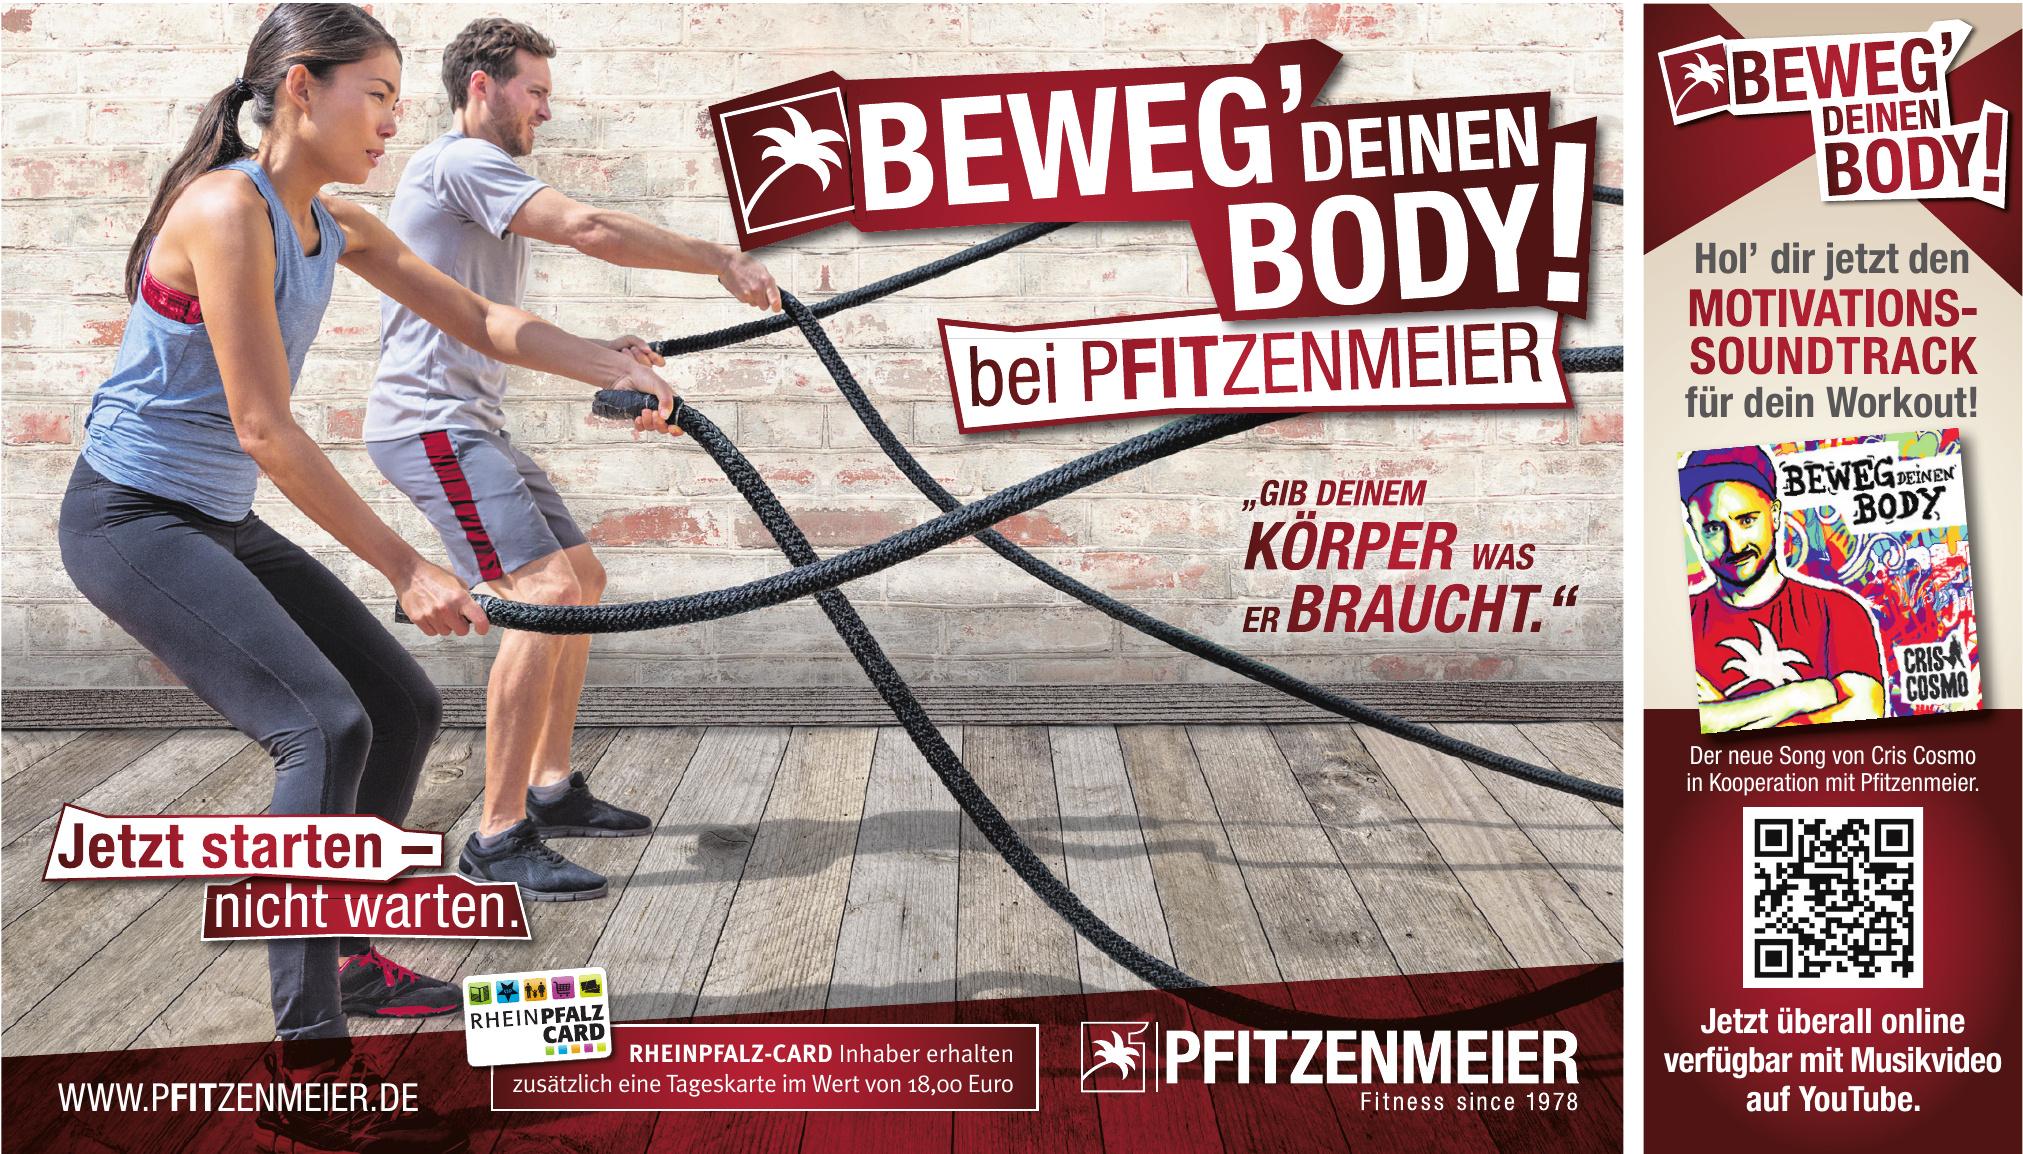 Fitnessstudio Pfitzenmeier Premium